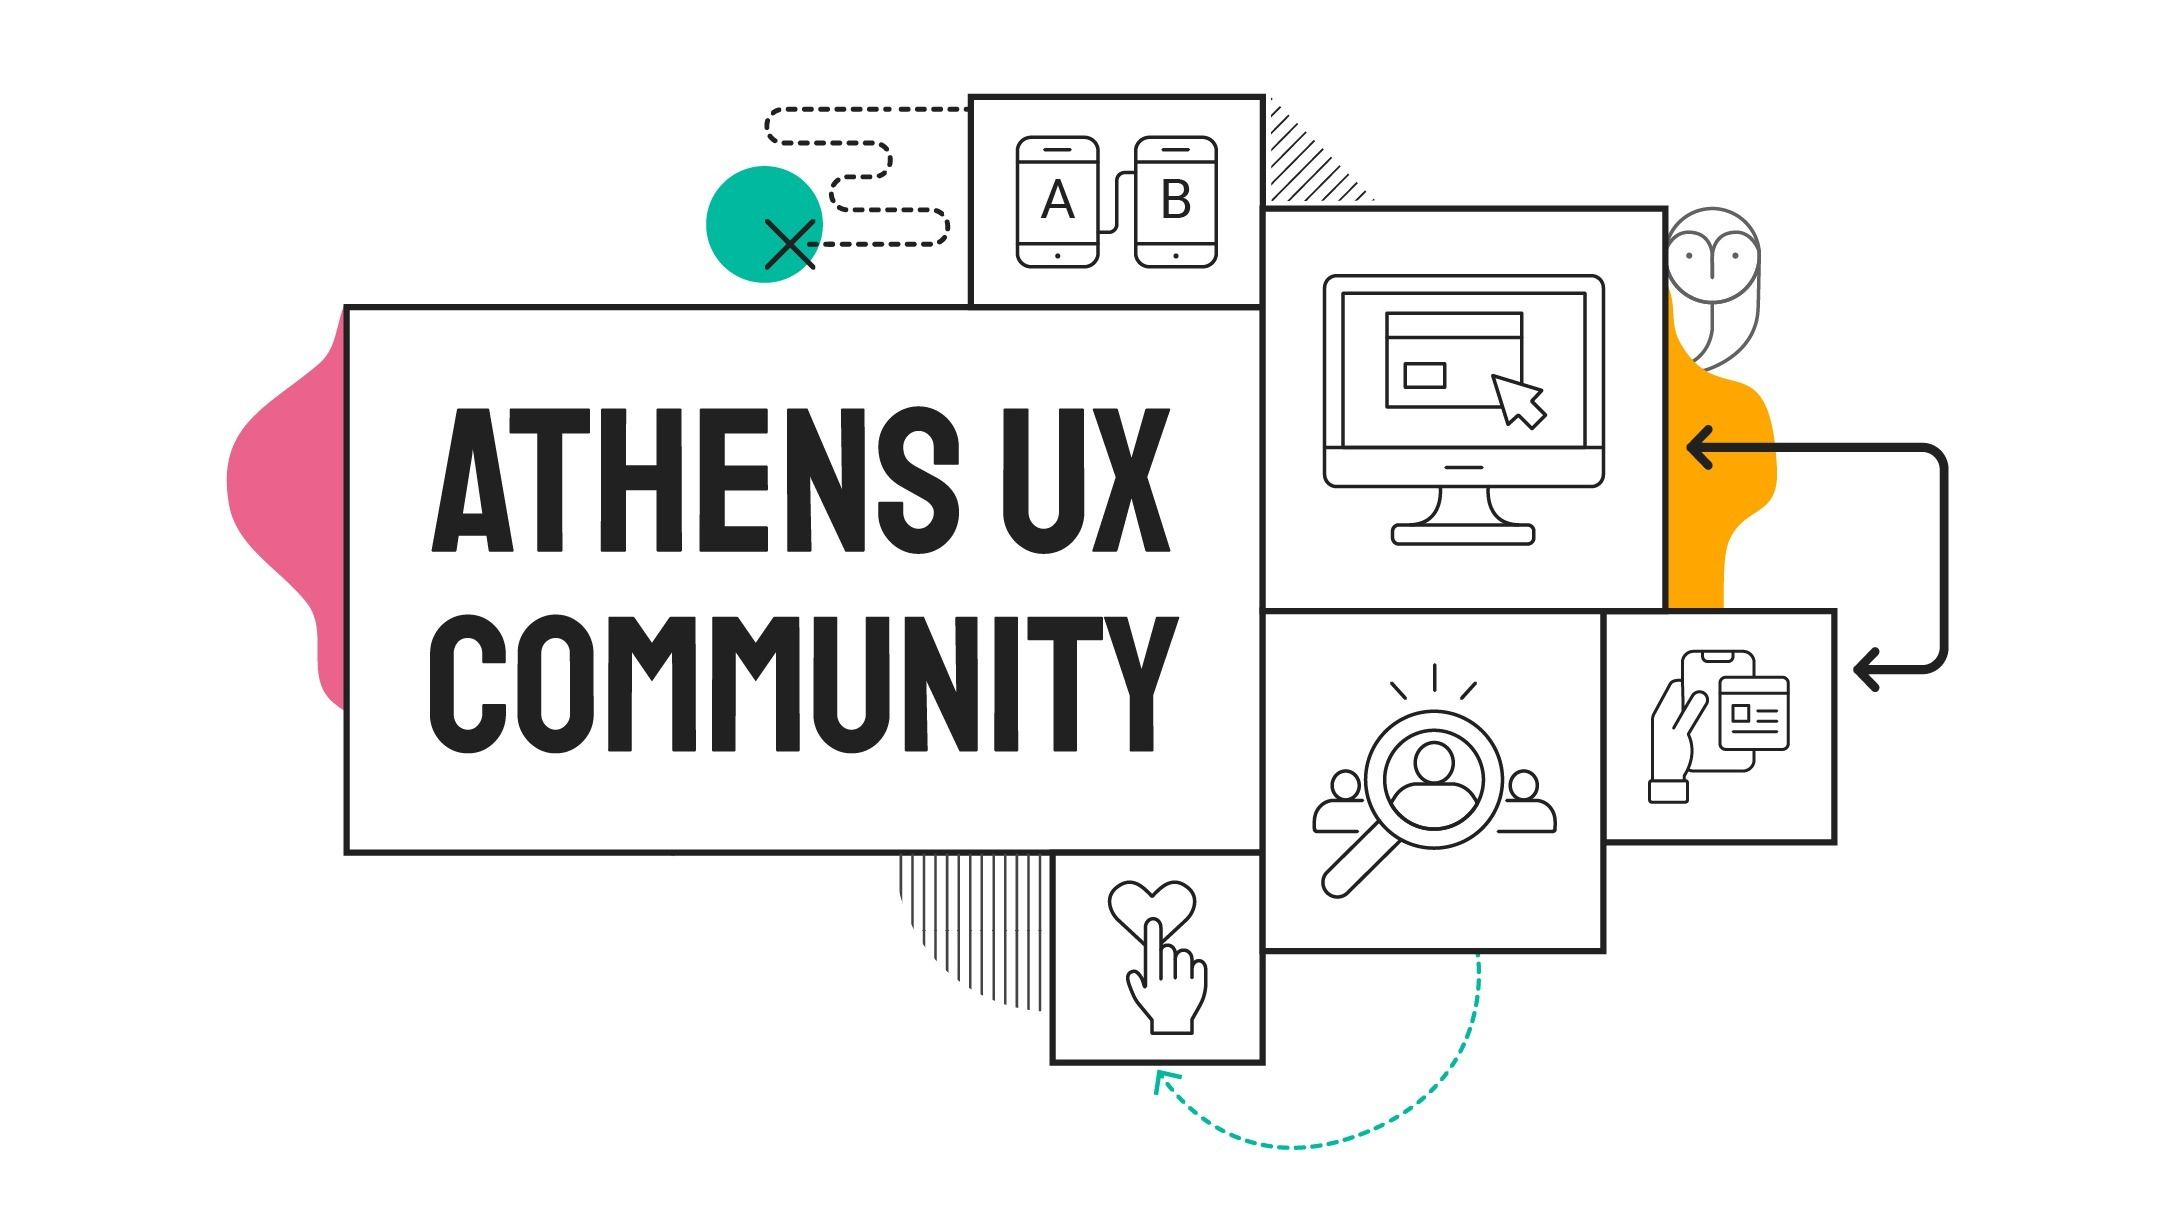 Athens UX Community